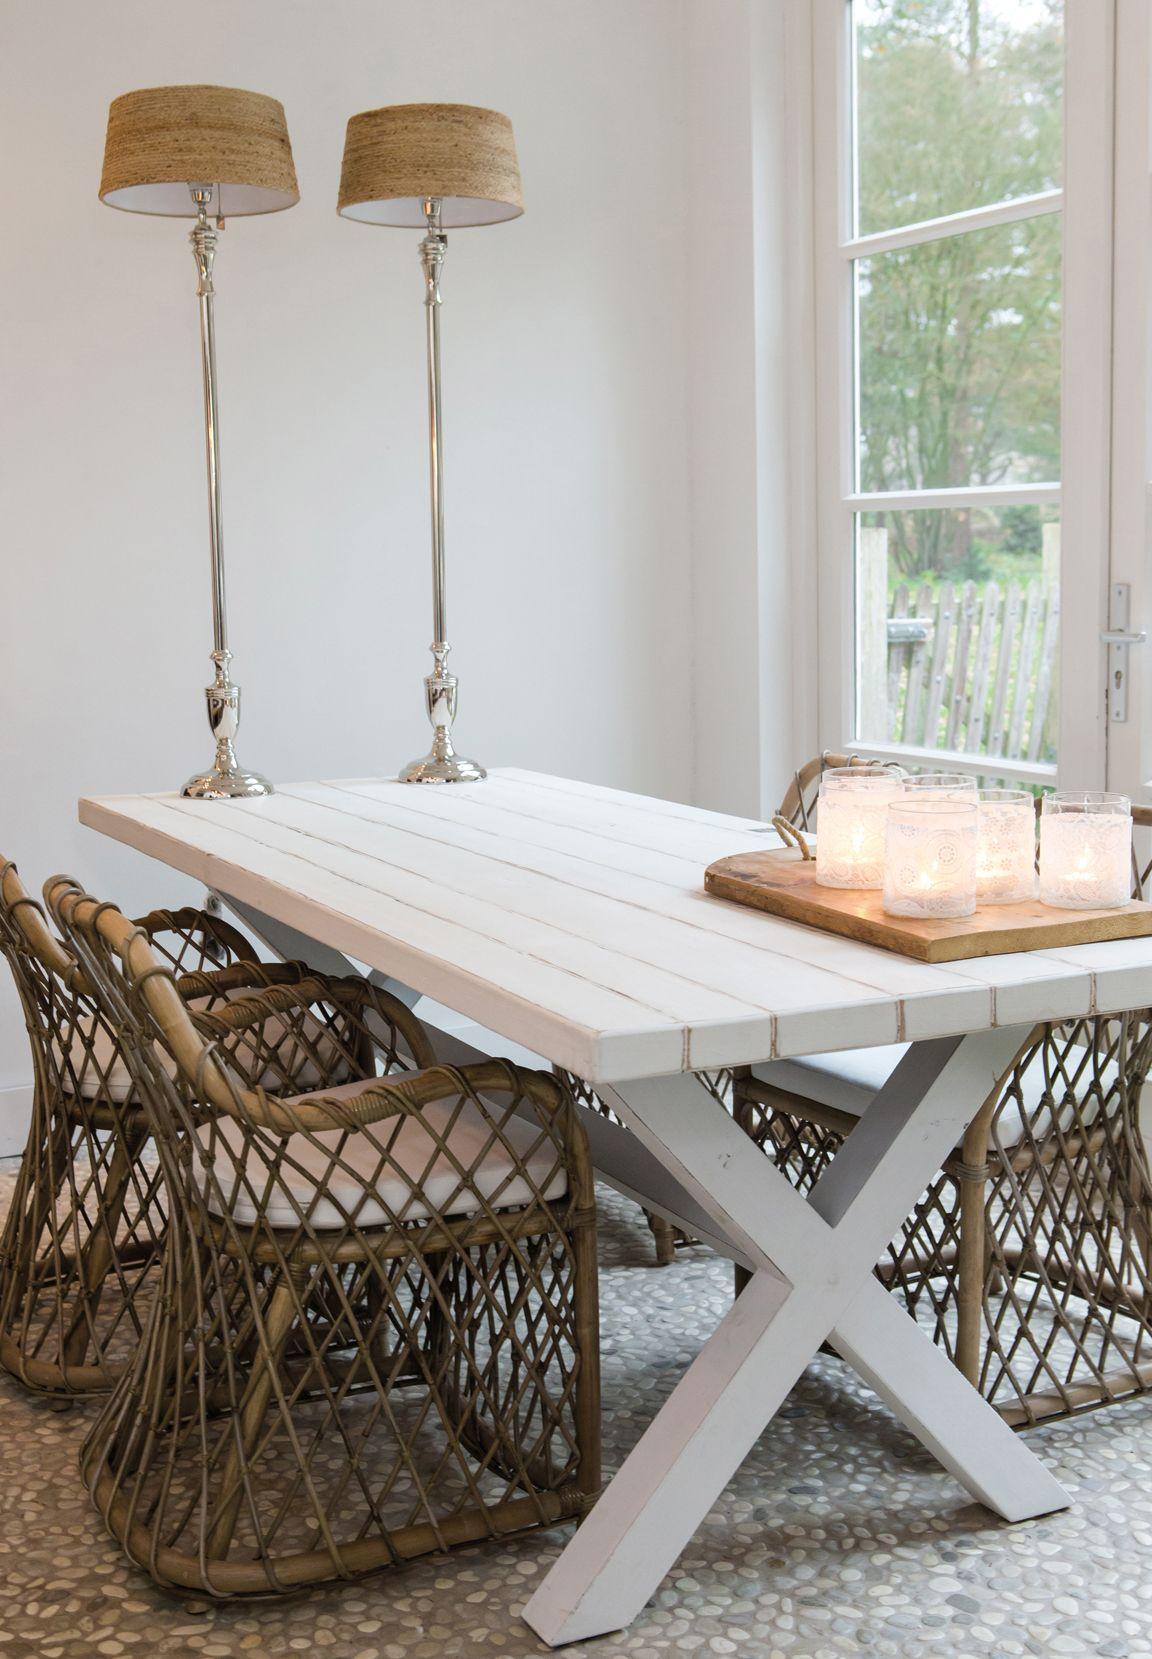 Riviera Maison sfeer aqua beige woonkamer inspiratie | Rattan ...